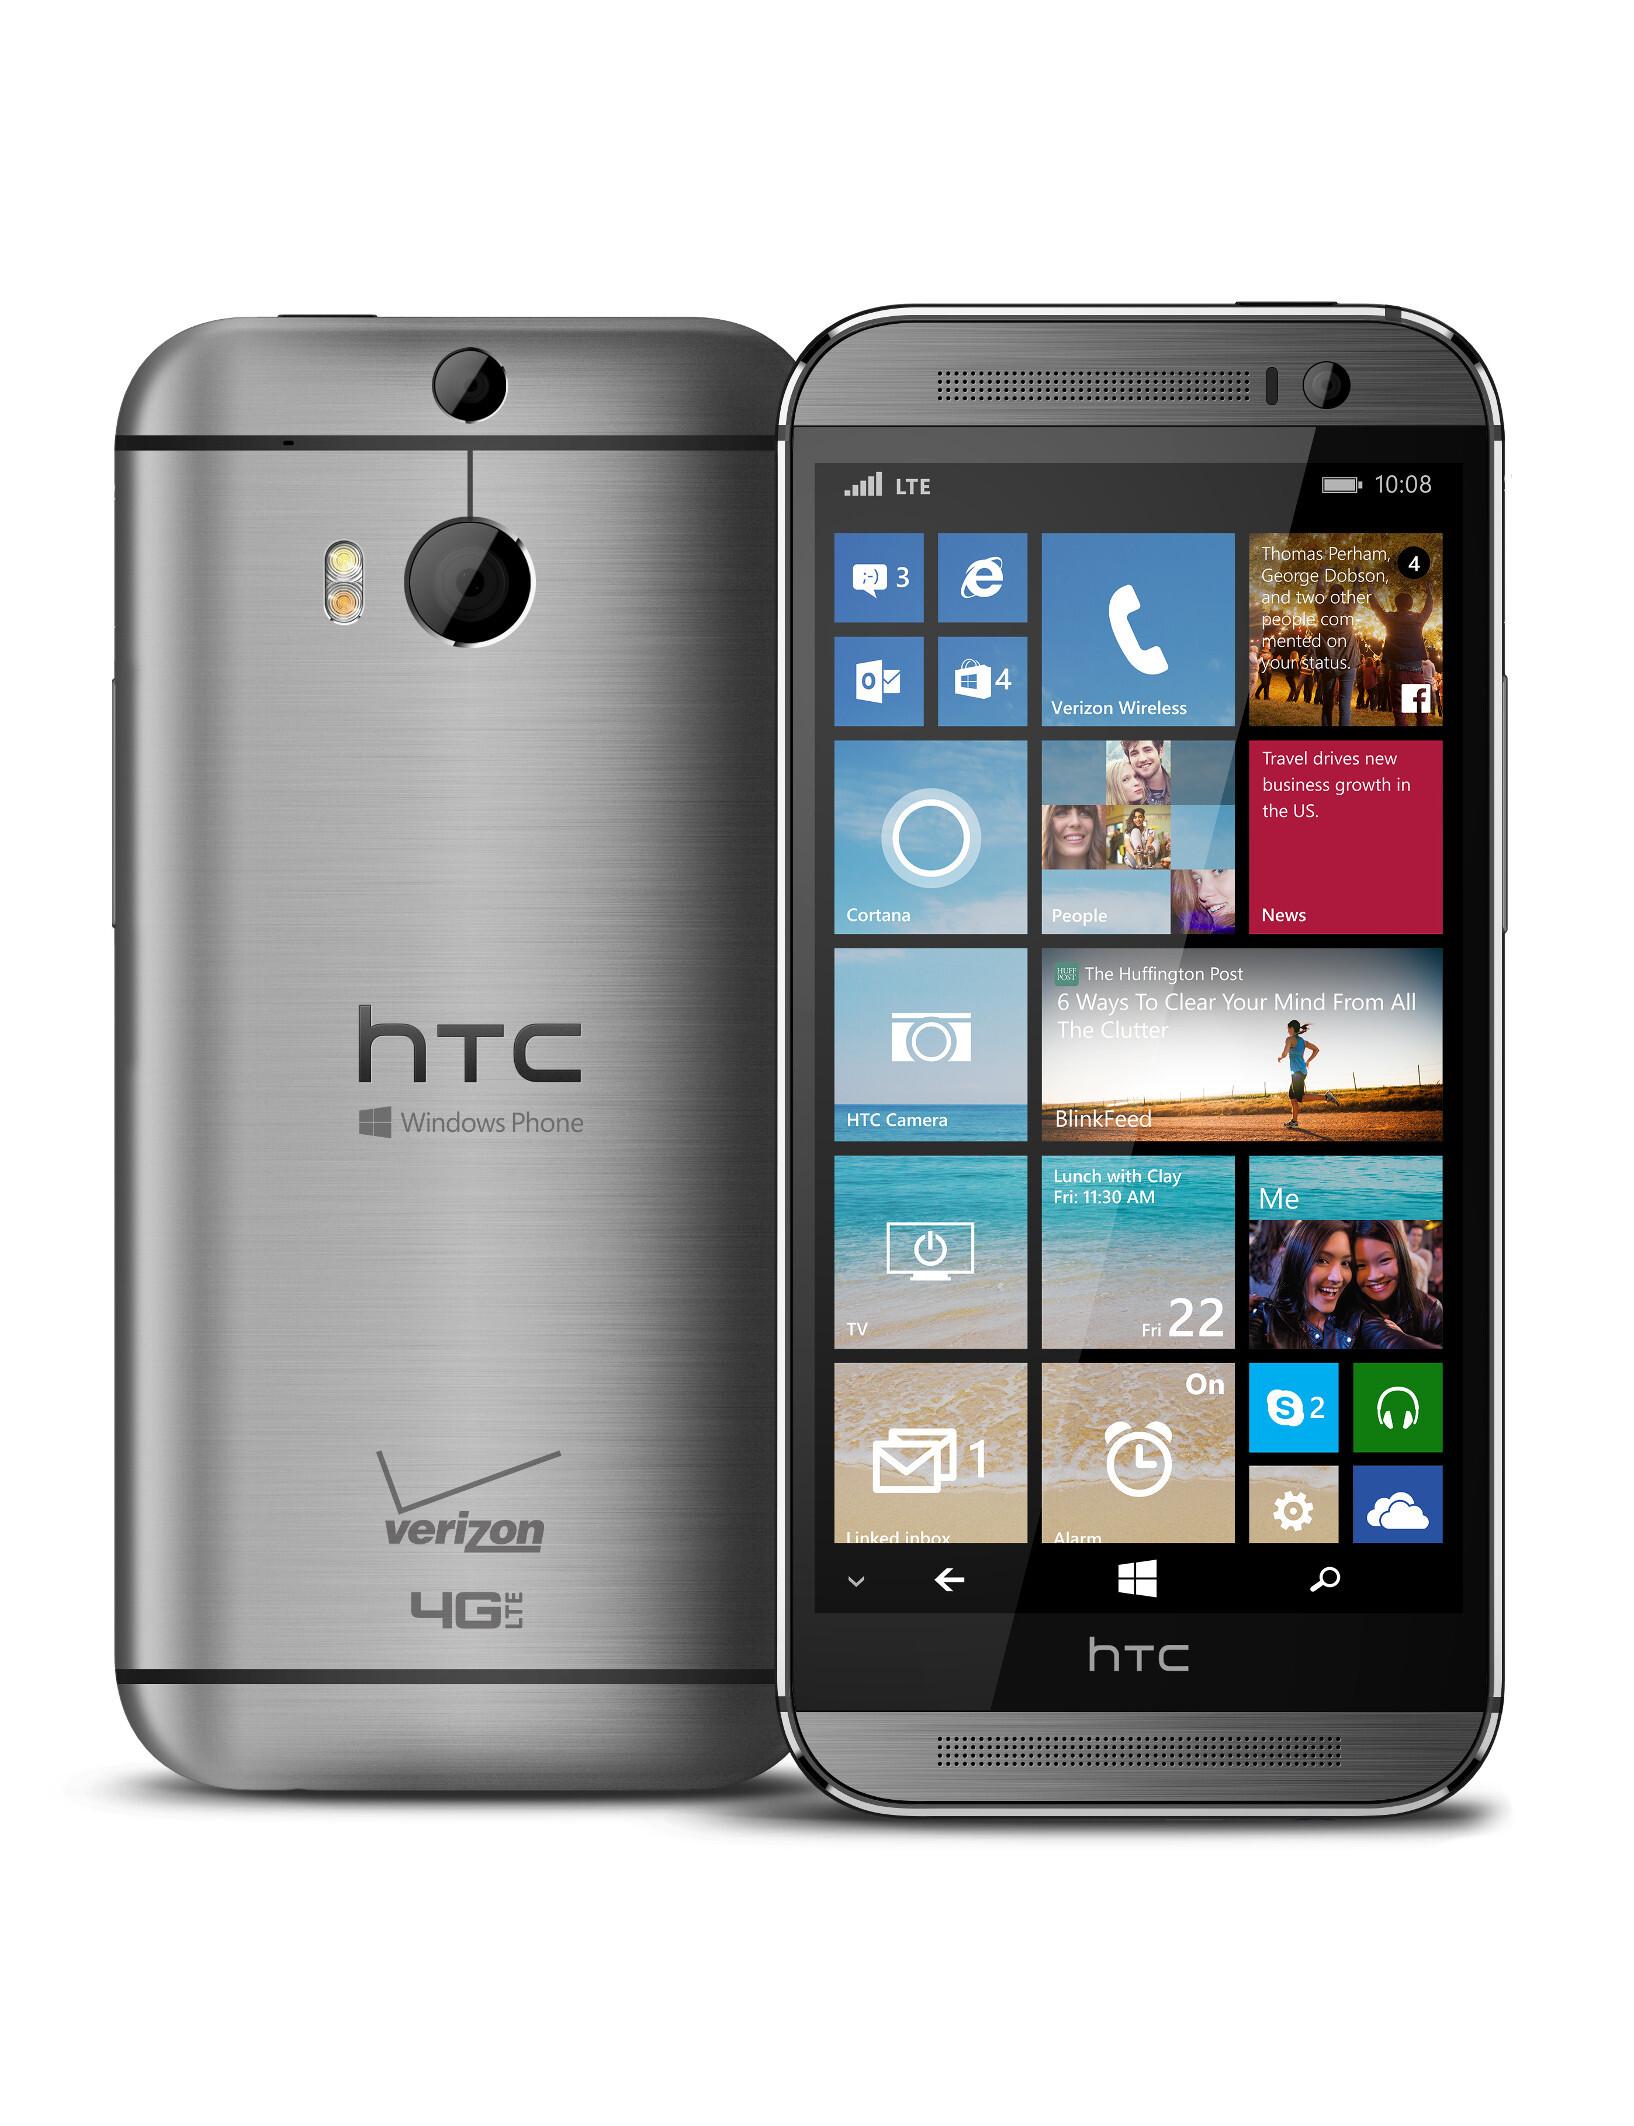 htc phones verizon. htc one (m8) for windows htc phones verizon